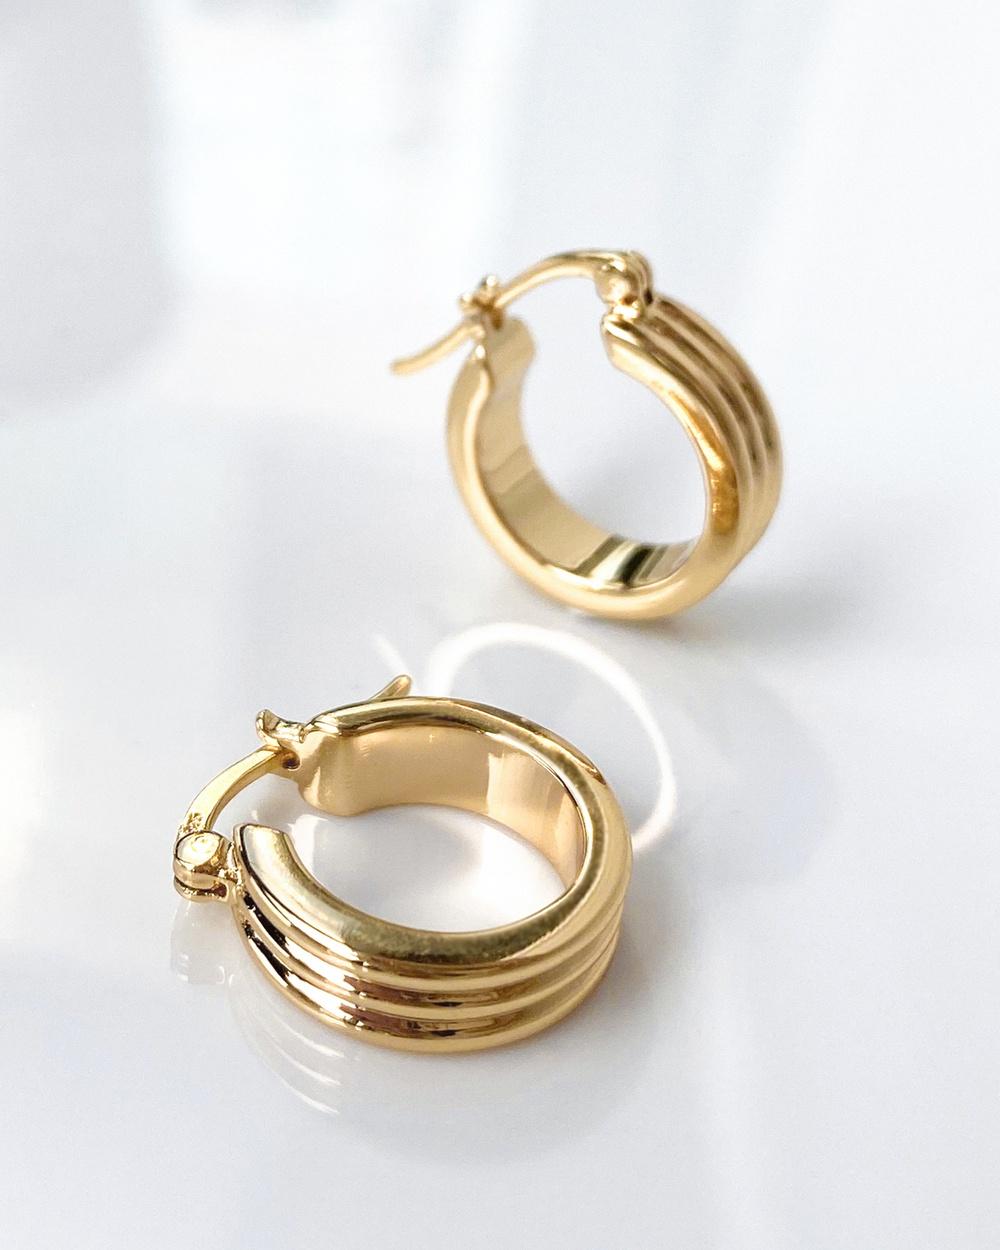 Wanderlust + Co Triple Band Gold 11mm Hinged Huggie Earrings Jewellery Gold